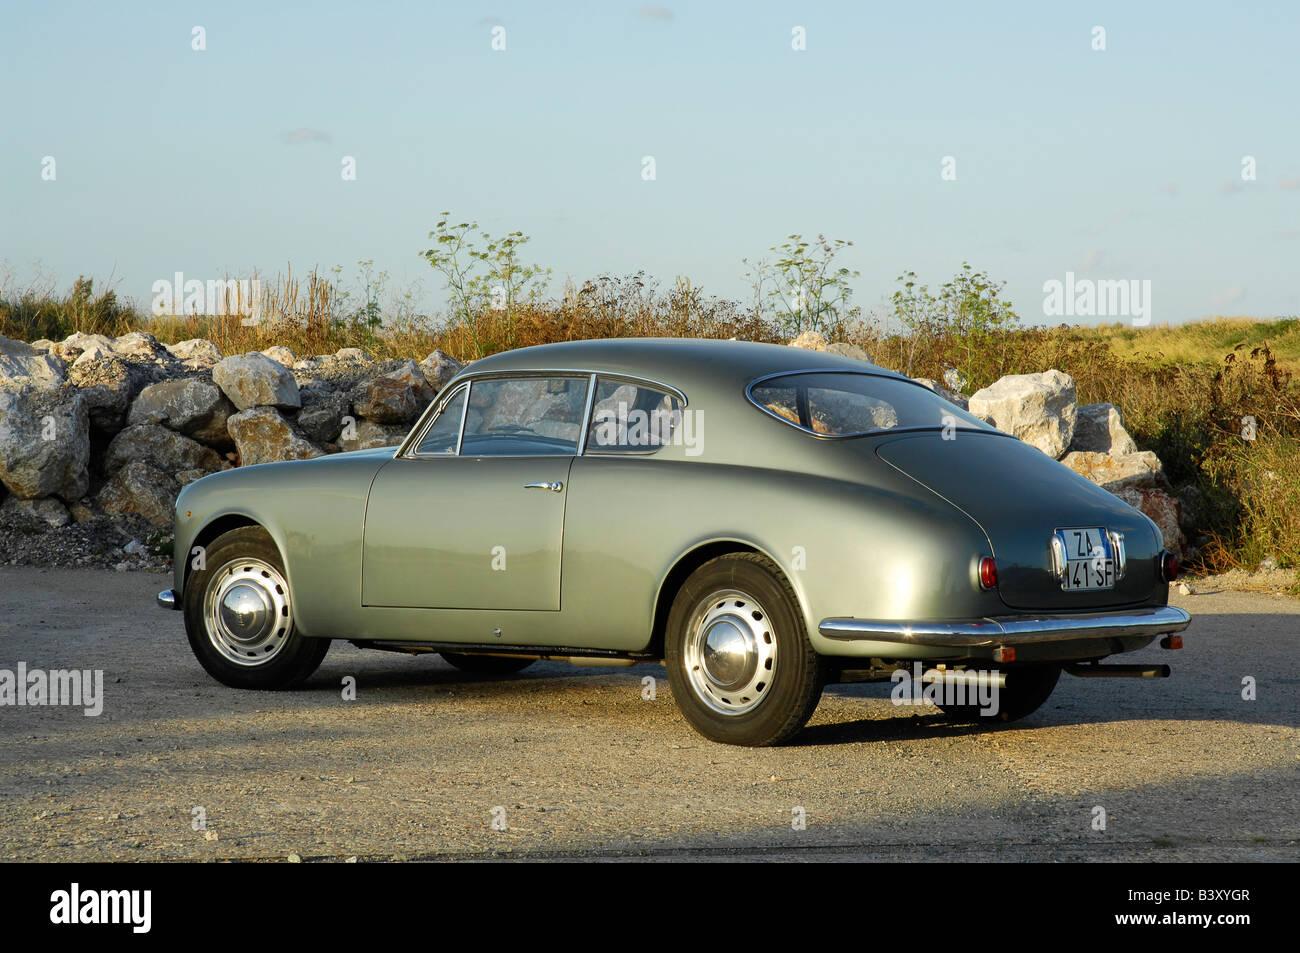 Lancia Aurelia 1957 - Stock Image